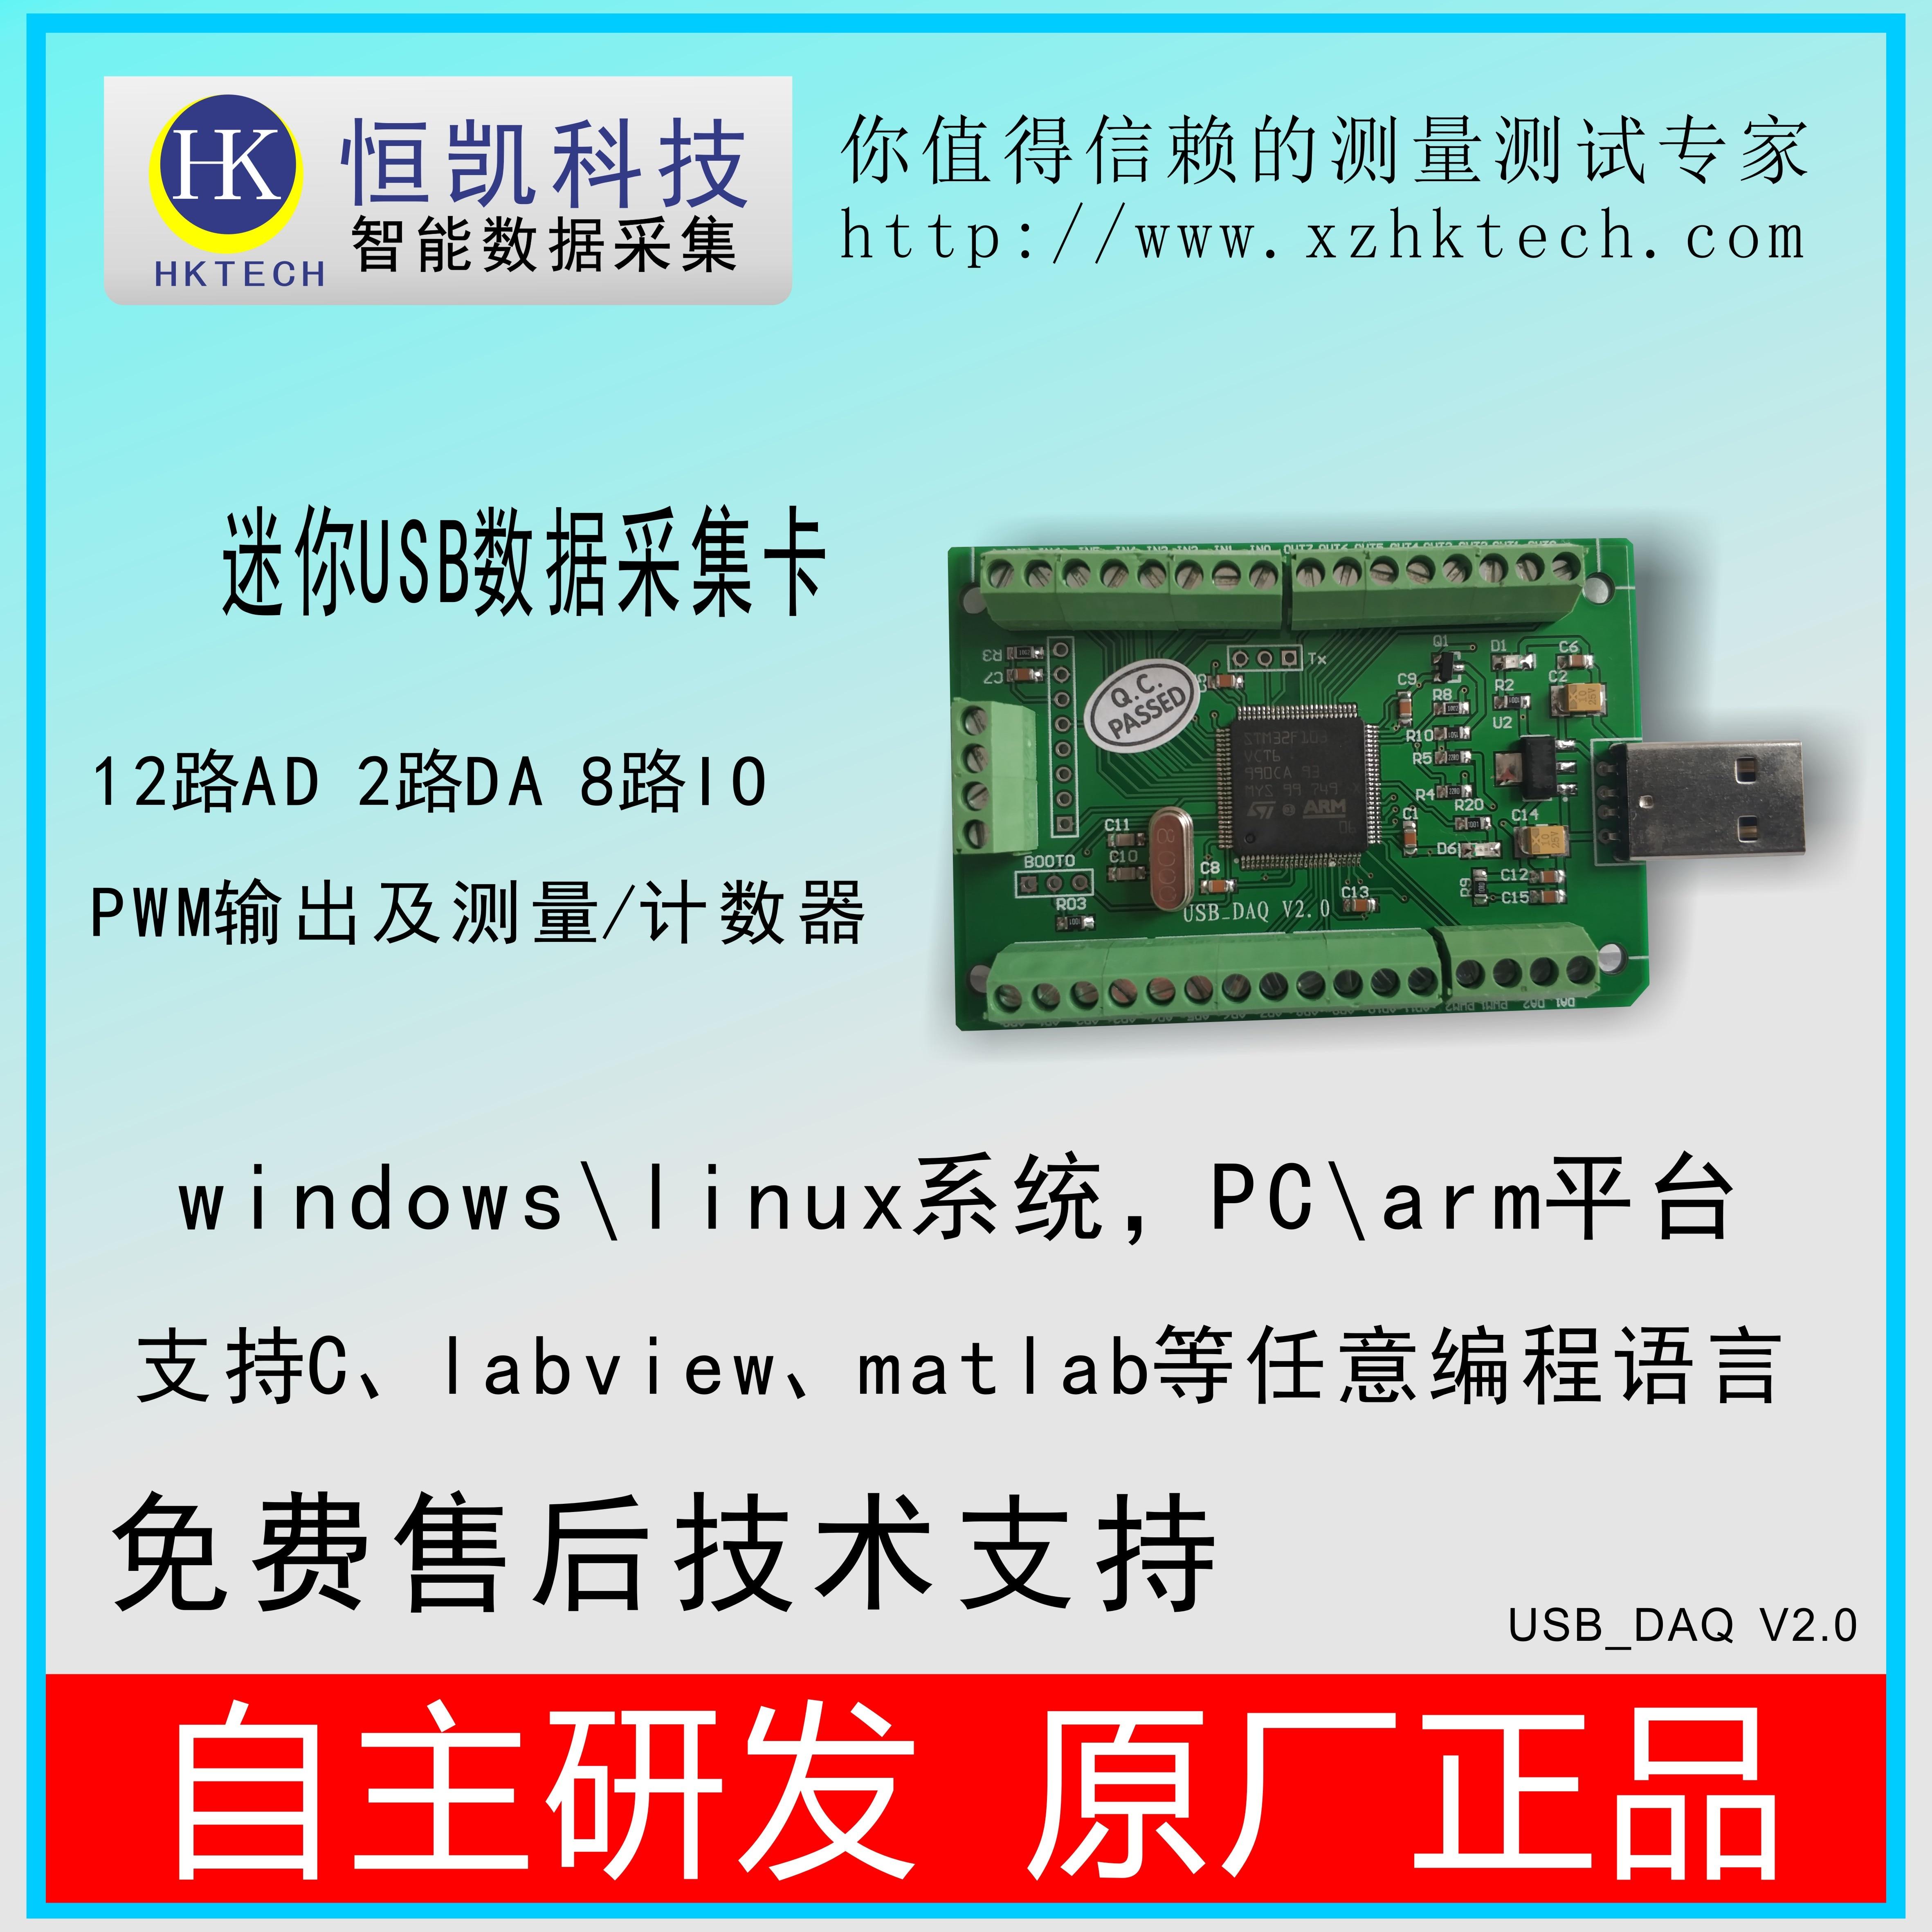 Mini USB Data Acquisition Card -12 Road AD/2 Road DA/8 Road IO/PWM Output and Measurement / CounterMini USB Data Acquisition Card -12 Road AD/2 Road DA/8 Road IO/PWM Output and Measurement / Counter